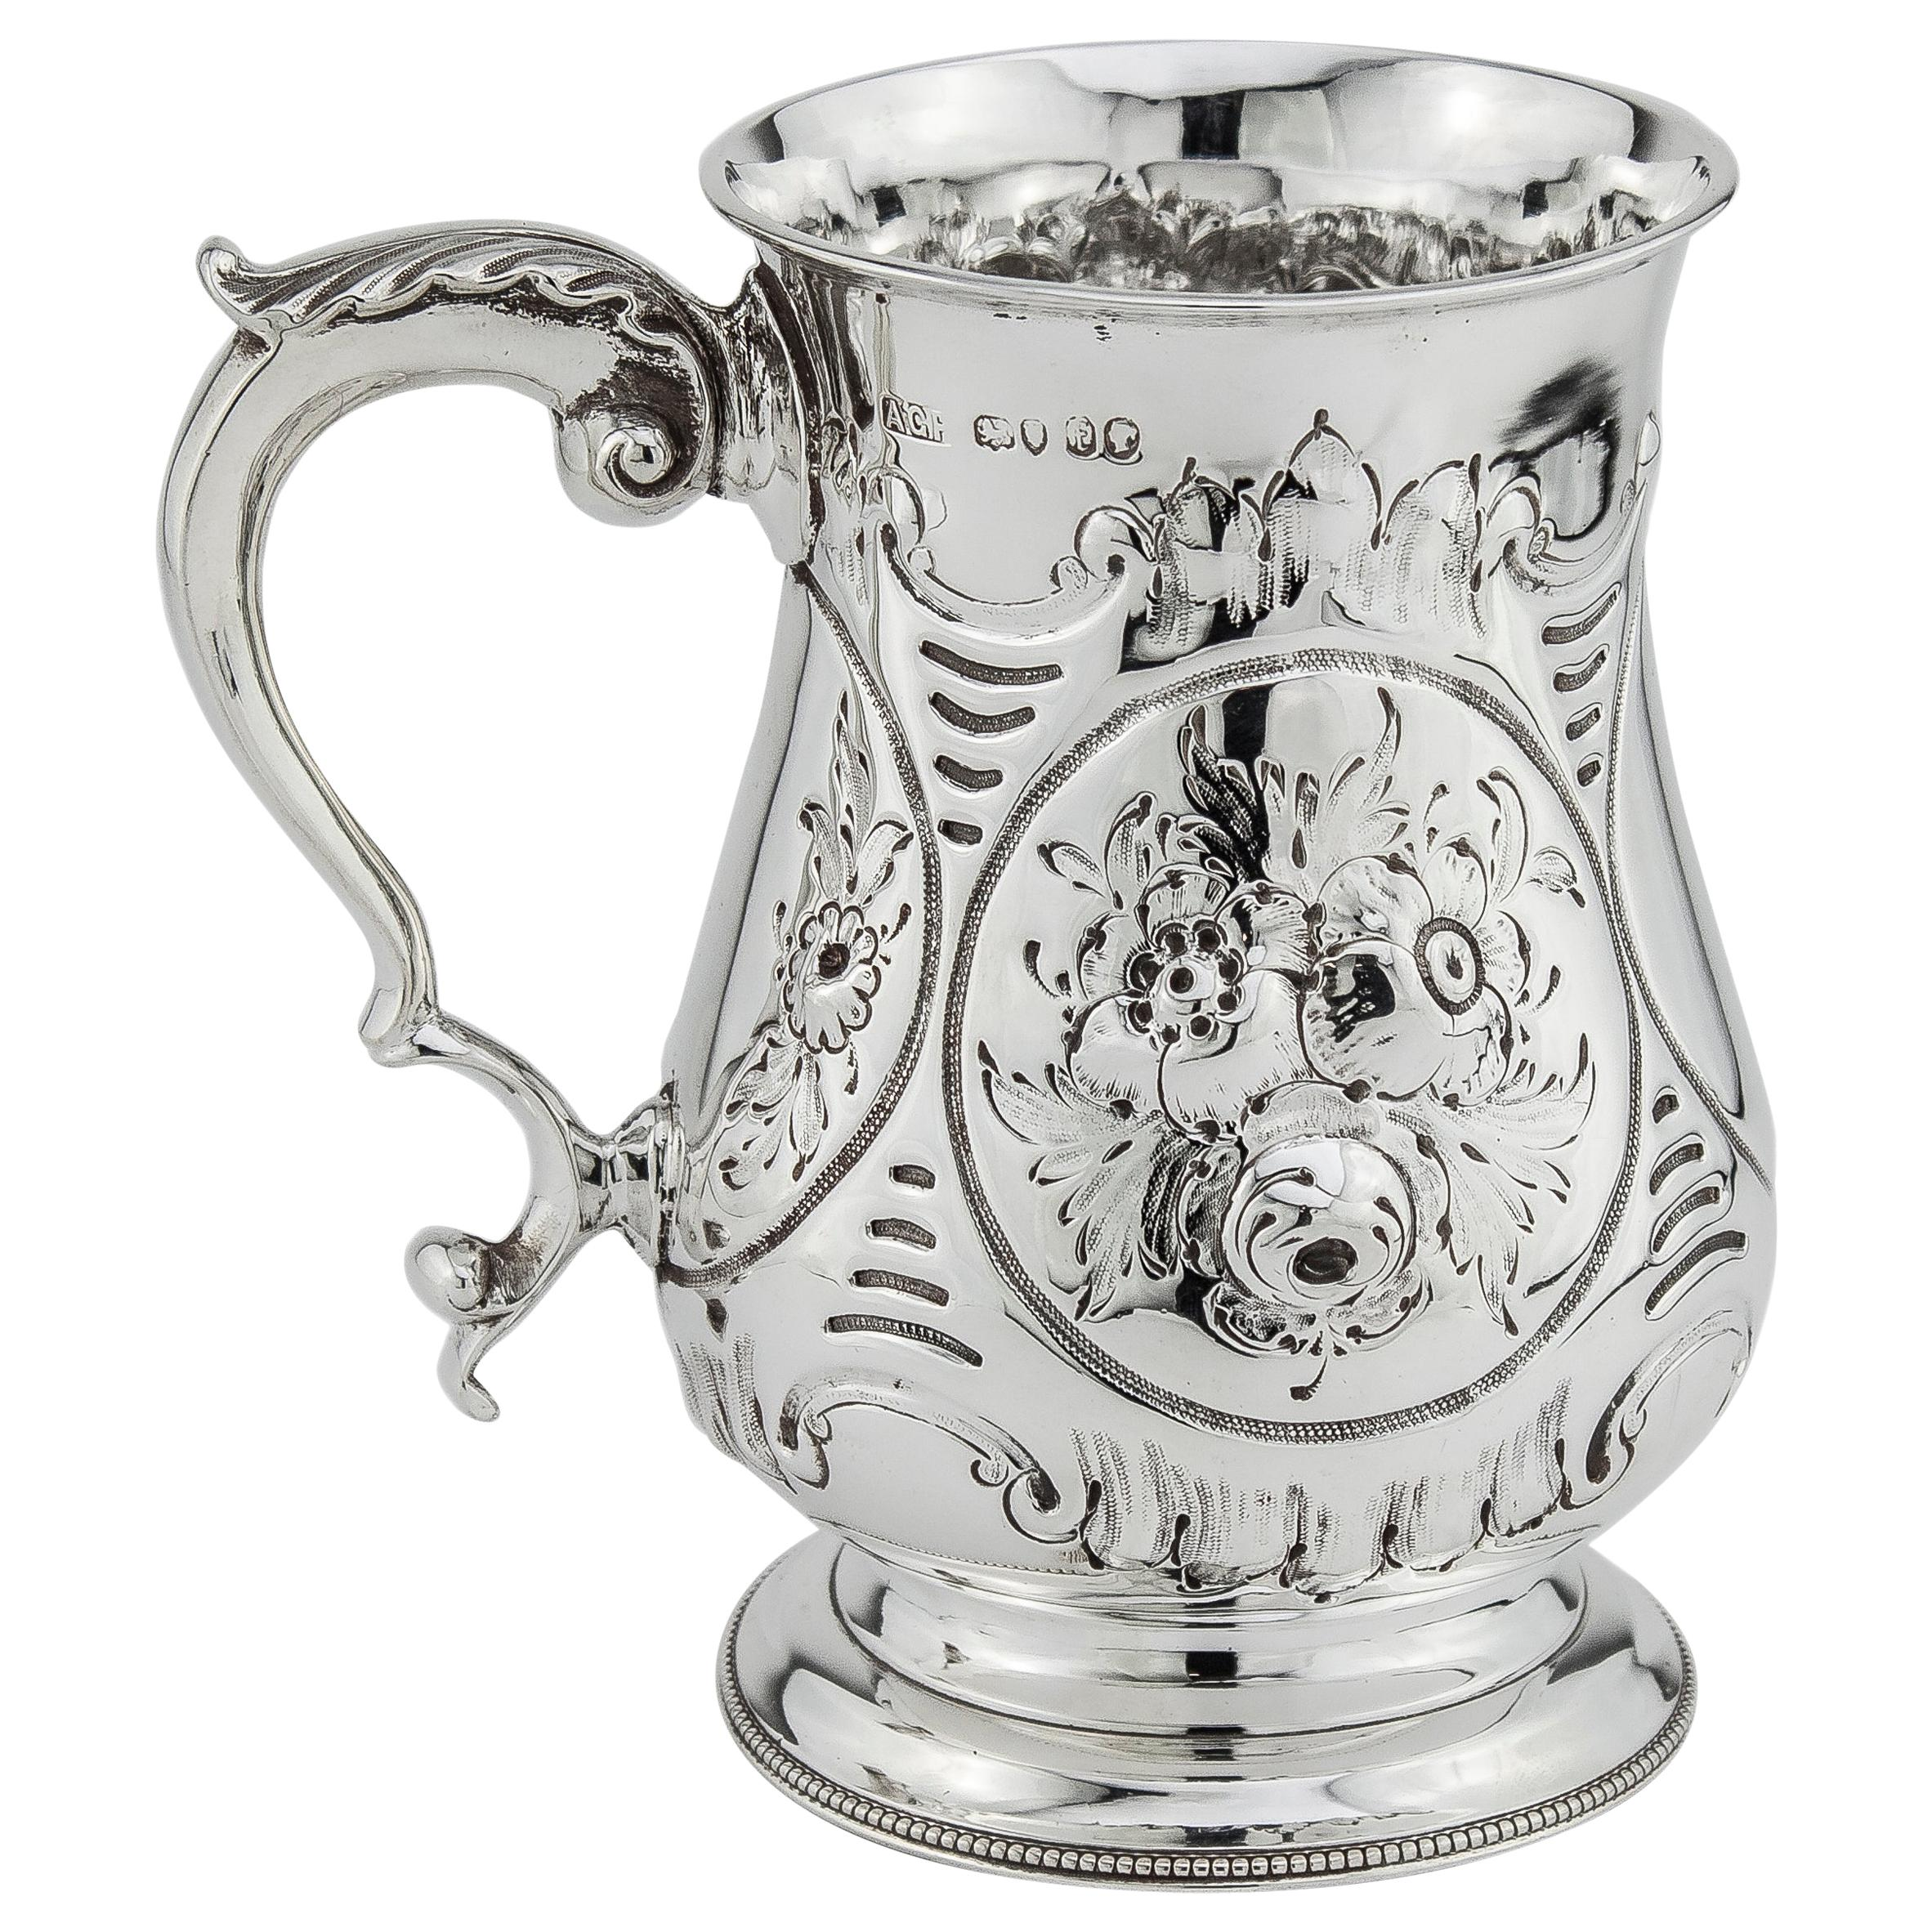 Antique Victorian Sterling Silver Tankard, London, 1861